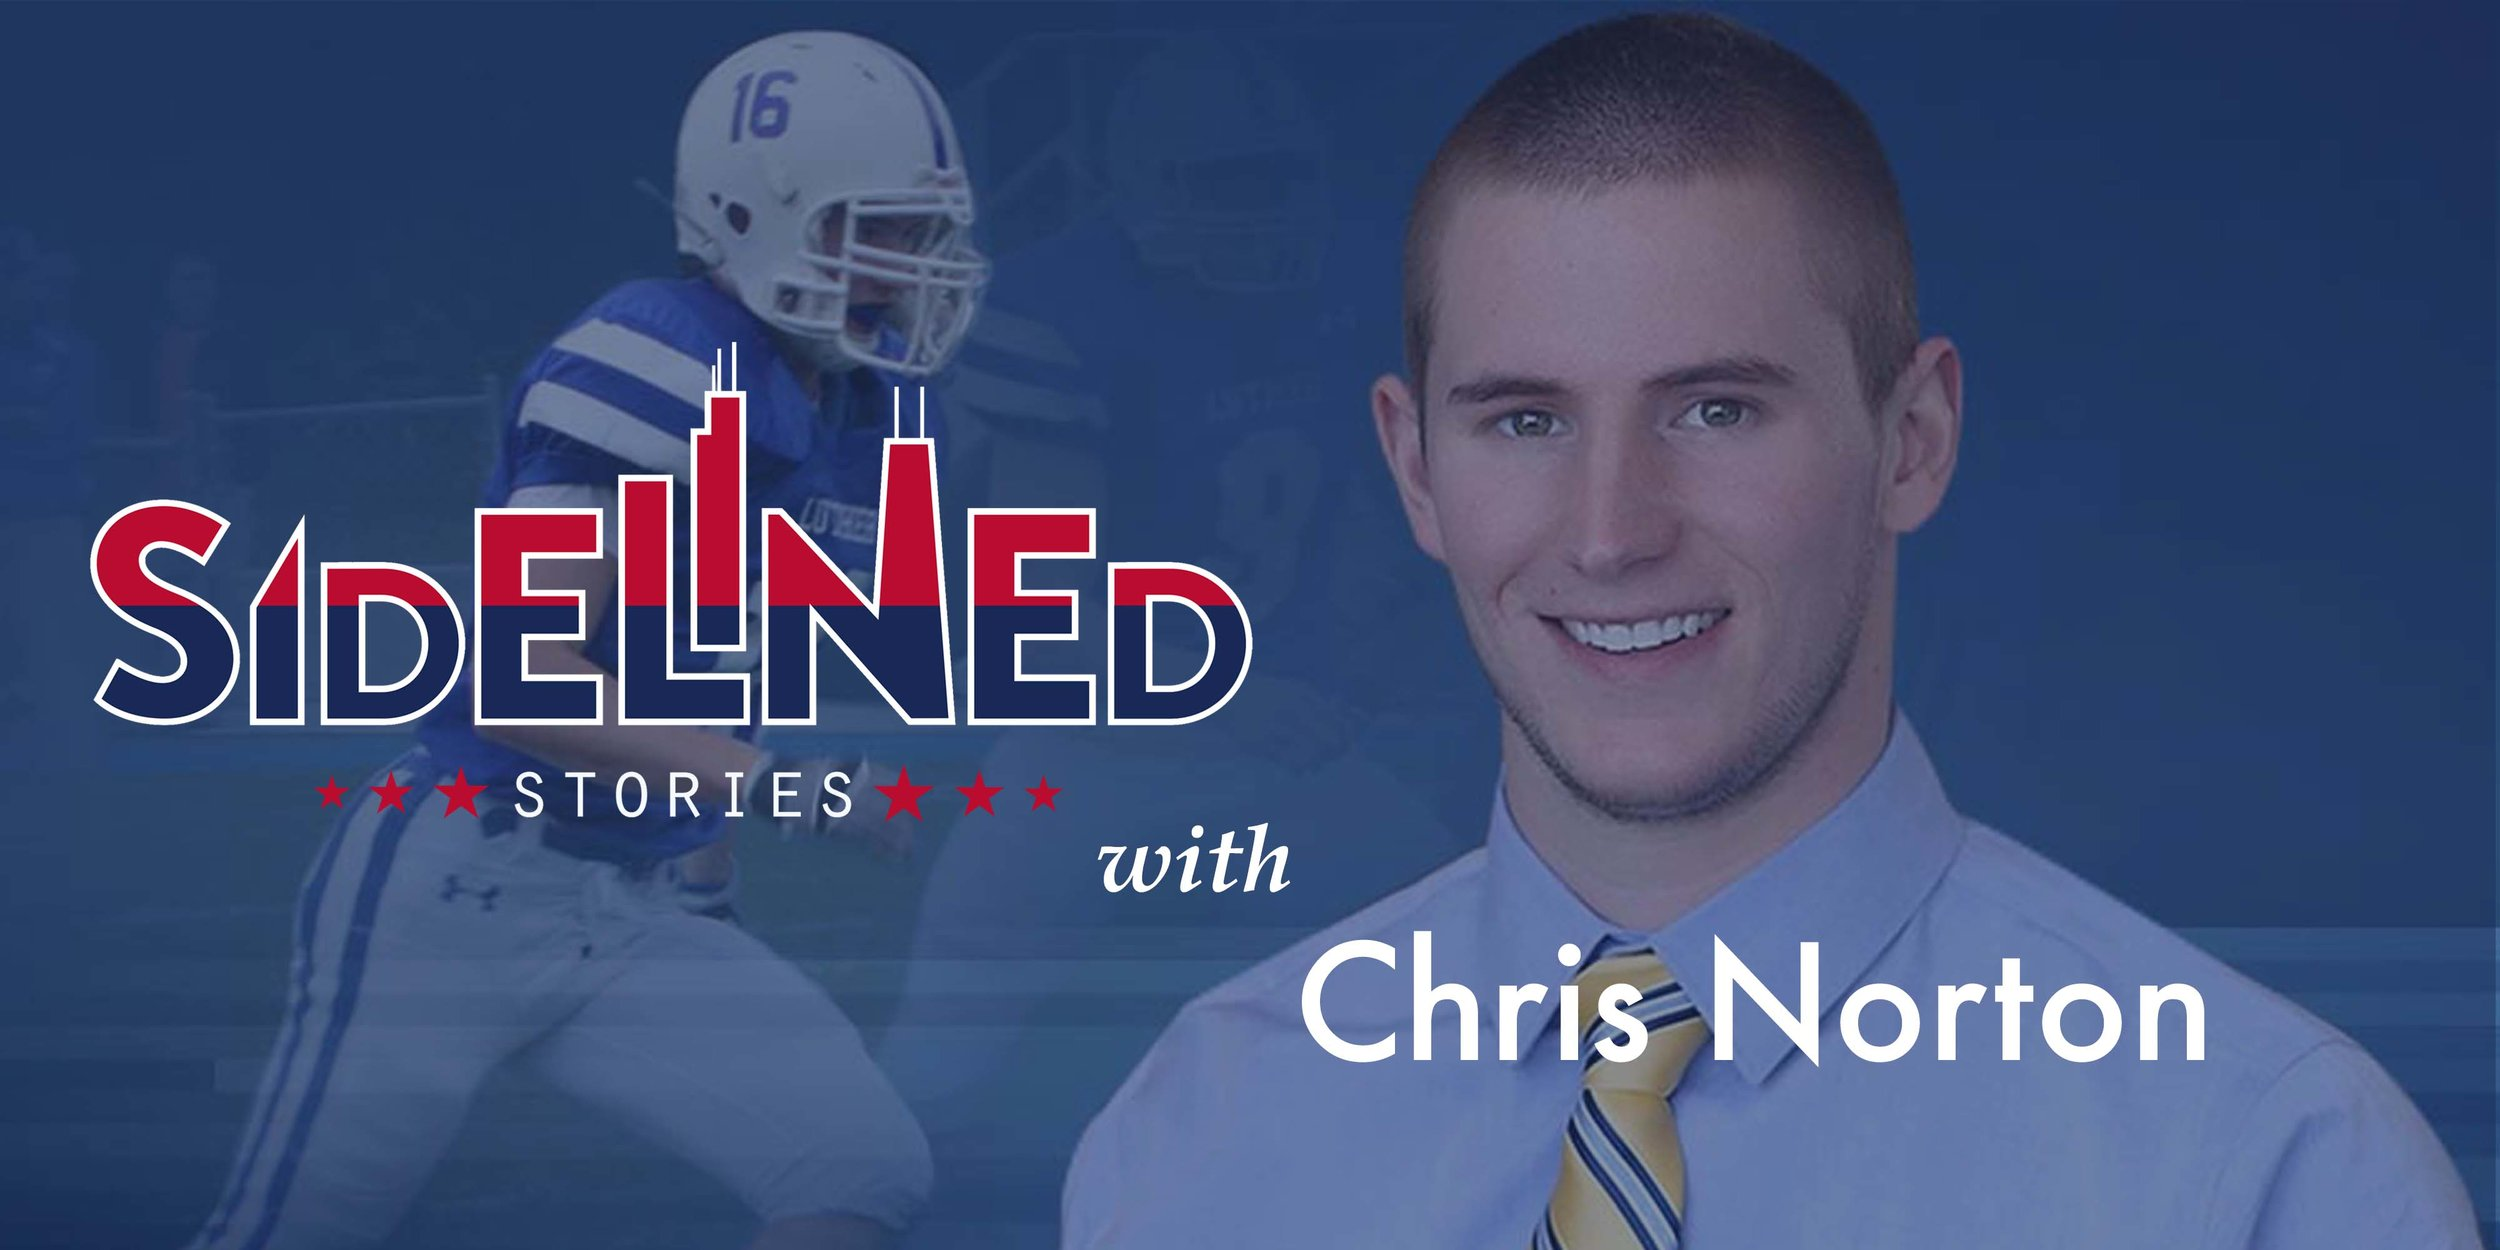 Chris Norton Sidelined Stories.jpg